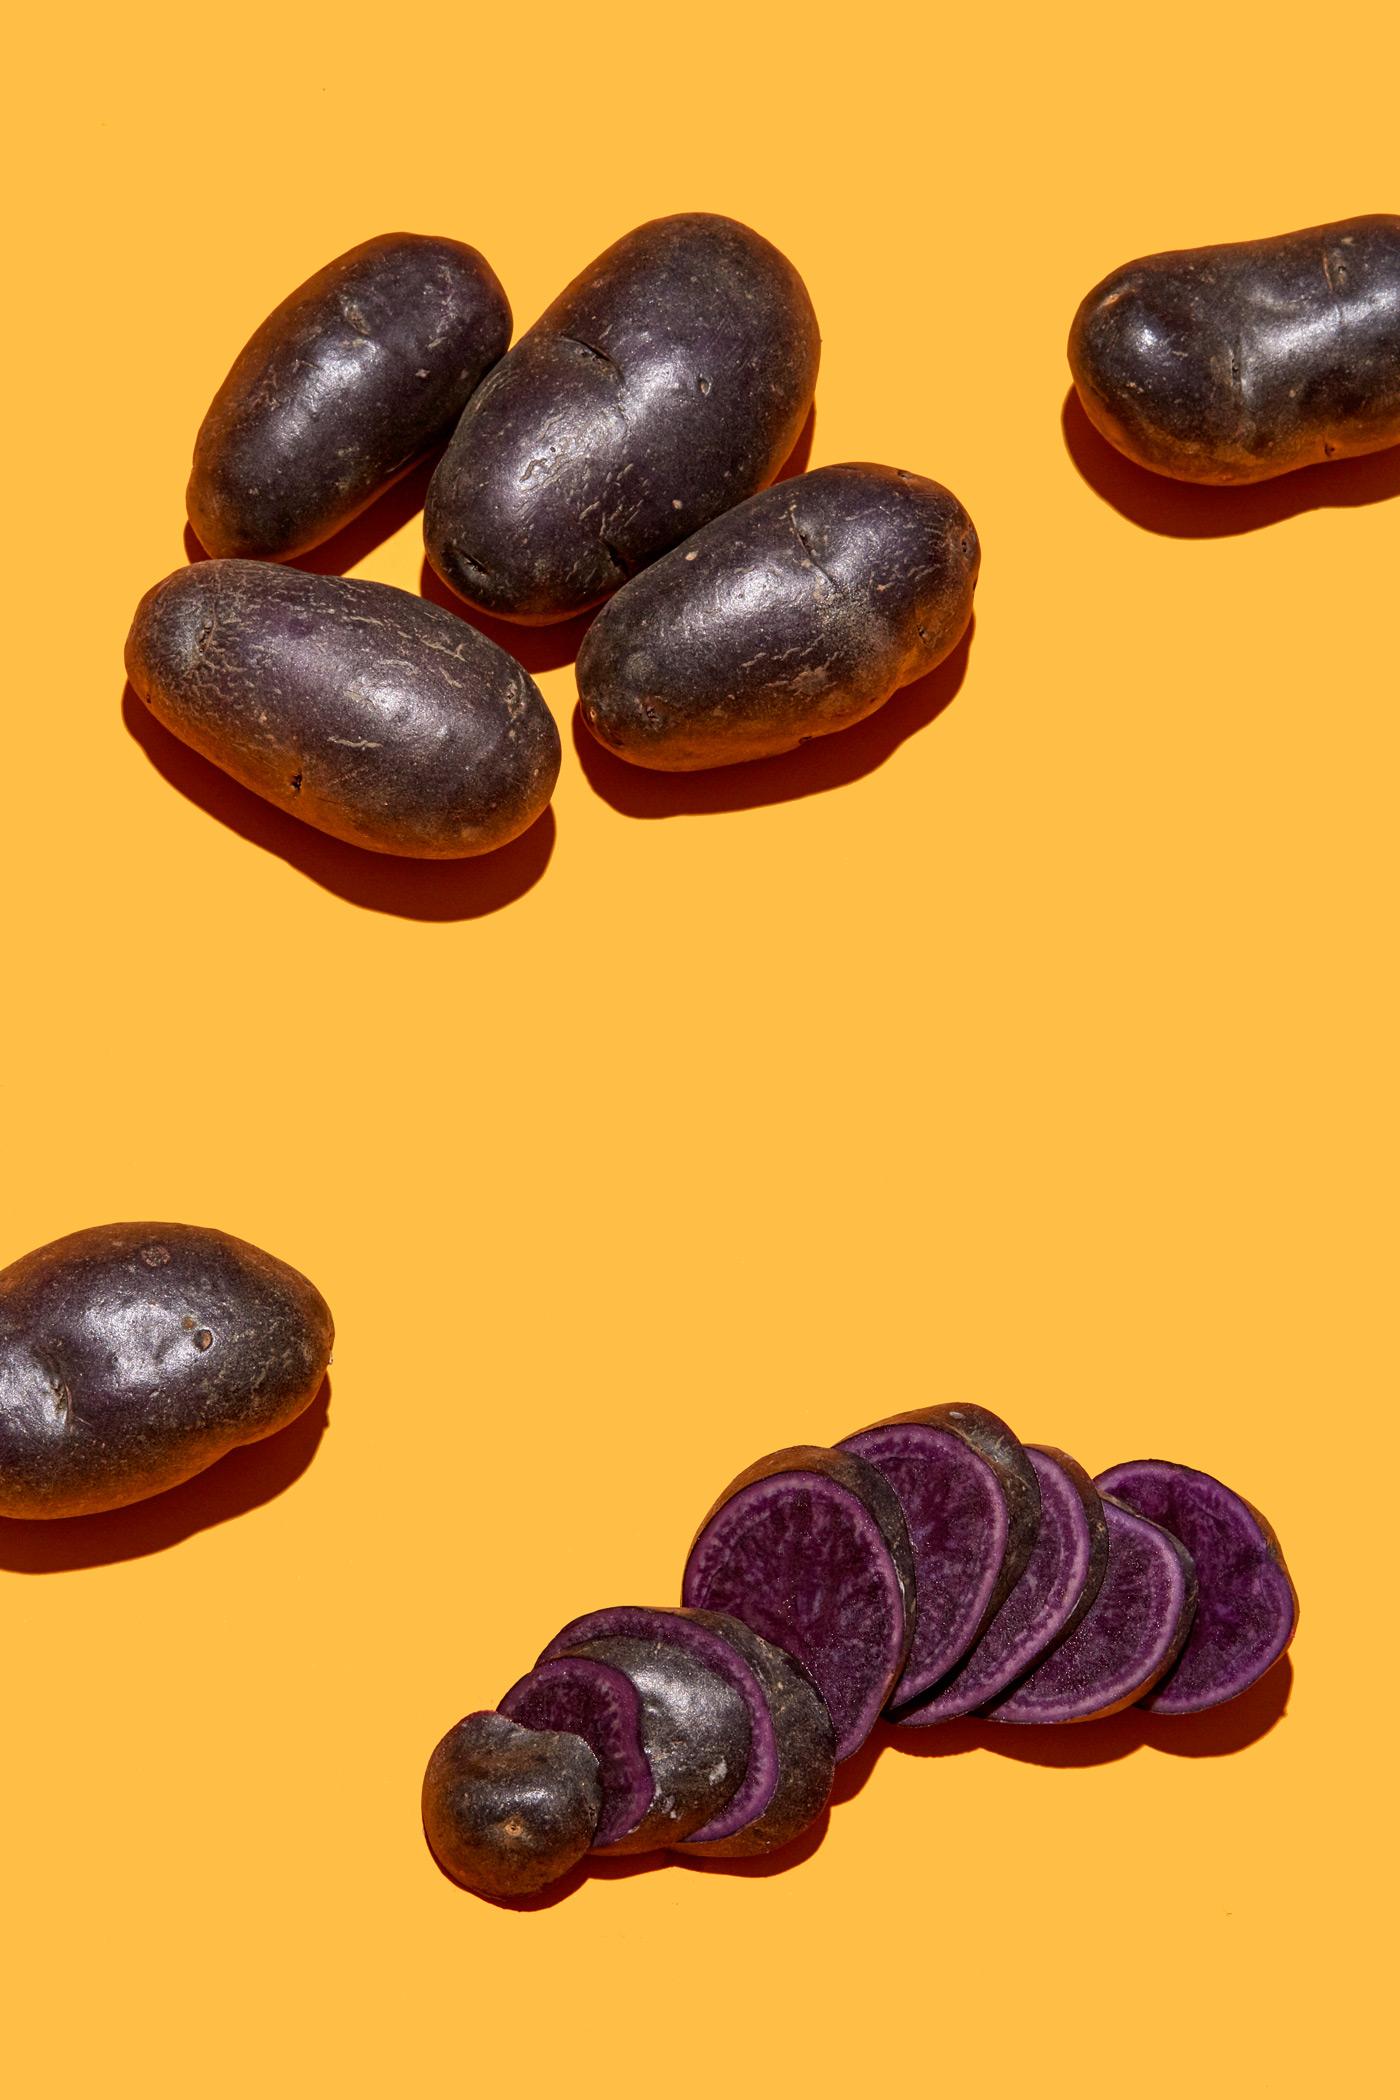 healthiest foods, health food, diet, nutrition, time.com stock, purple potatoes, vegetables